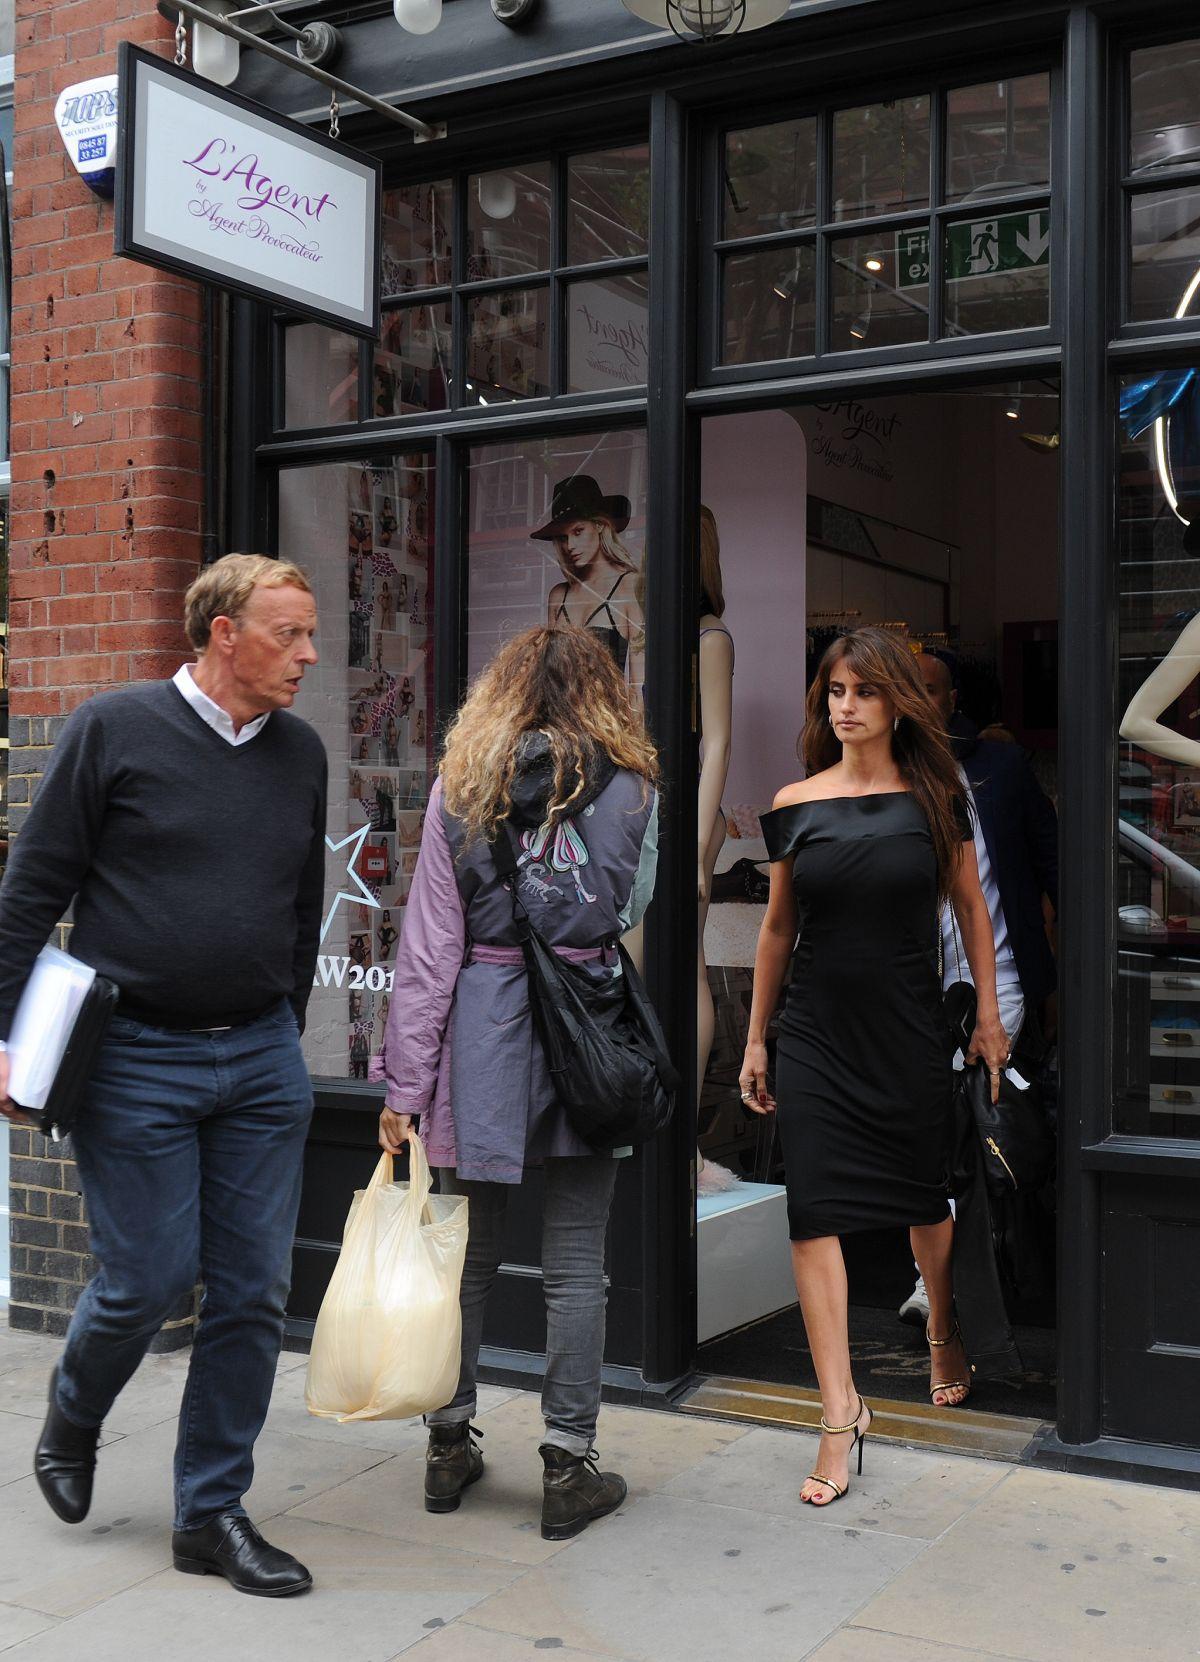 8df36edcecb PENELOPE CRUZ Leaves Agent Provocateur Lingerie Shop in London 09 04 2015